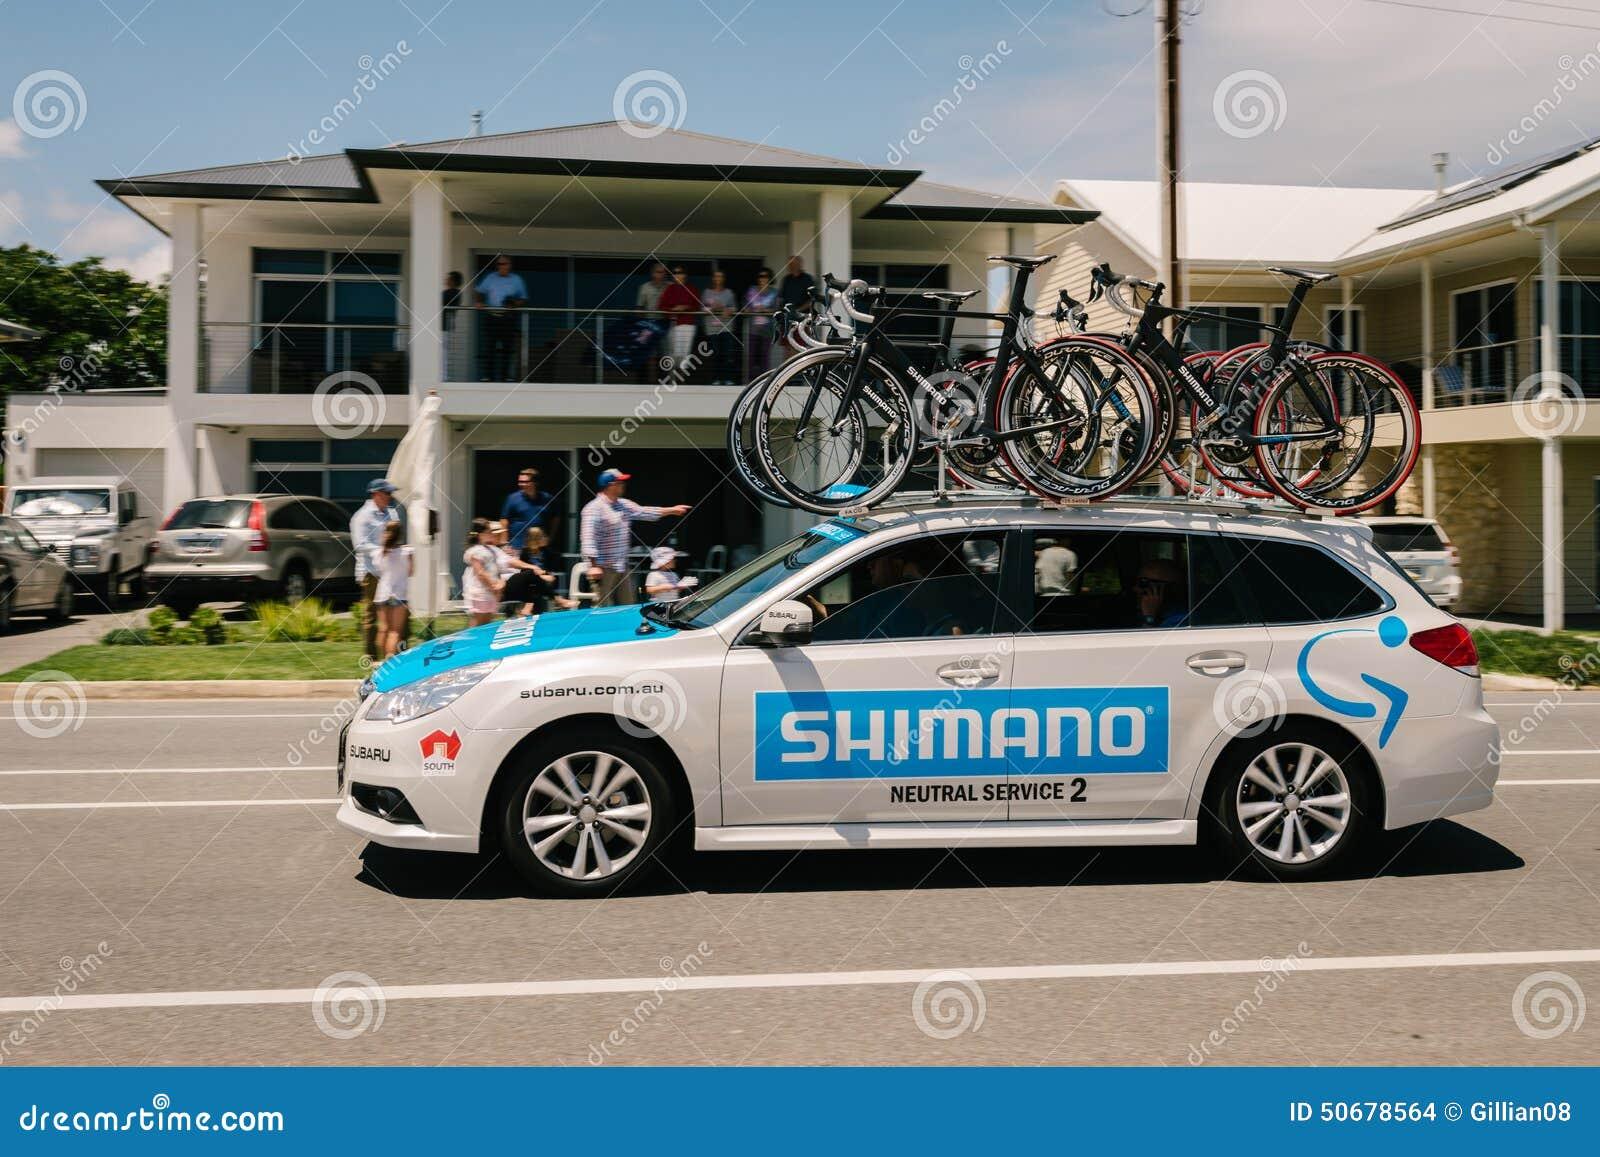 Download 在下下来桑托斯游览的支持车, 2015年1月 编辑类库存图片. 图片 包括有 桑托斯, 活动, 体育运动 - 50678564